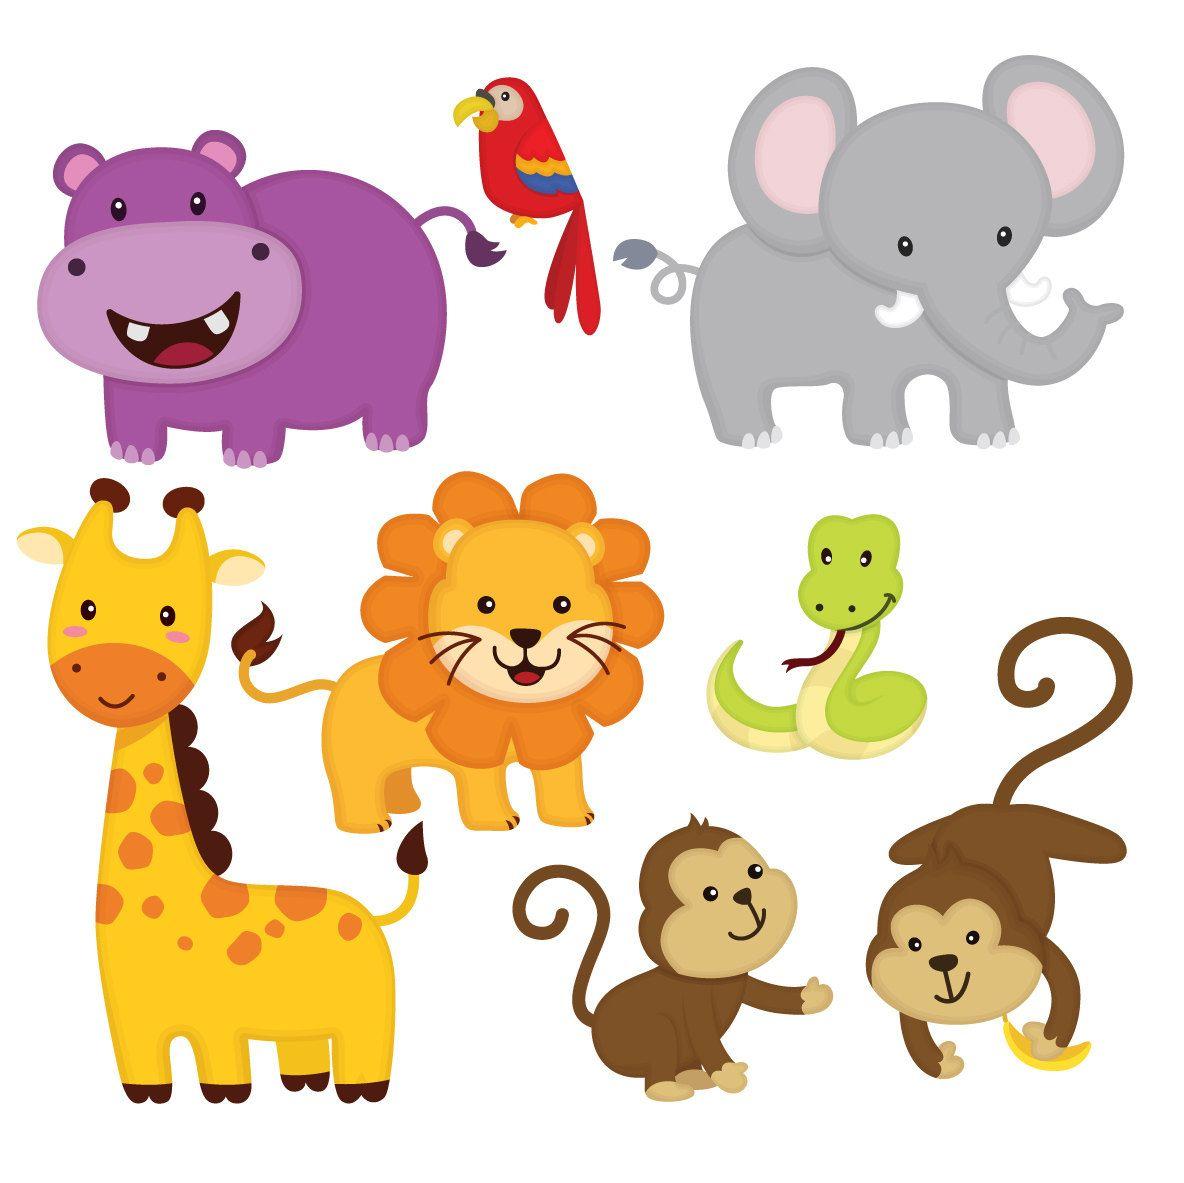 Jungle Animal Clip Art Jungle Friends Sticker Jungle Animal Etsy Cute Animal Clipart Animal Clipart Free Animal Clipart